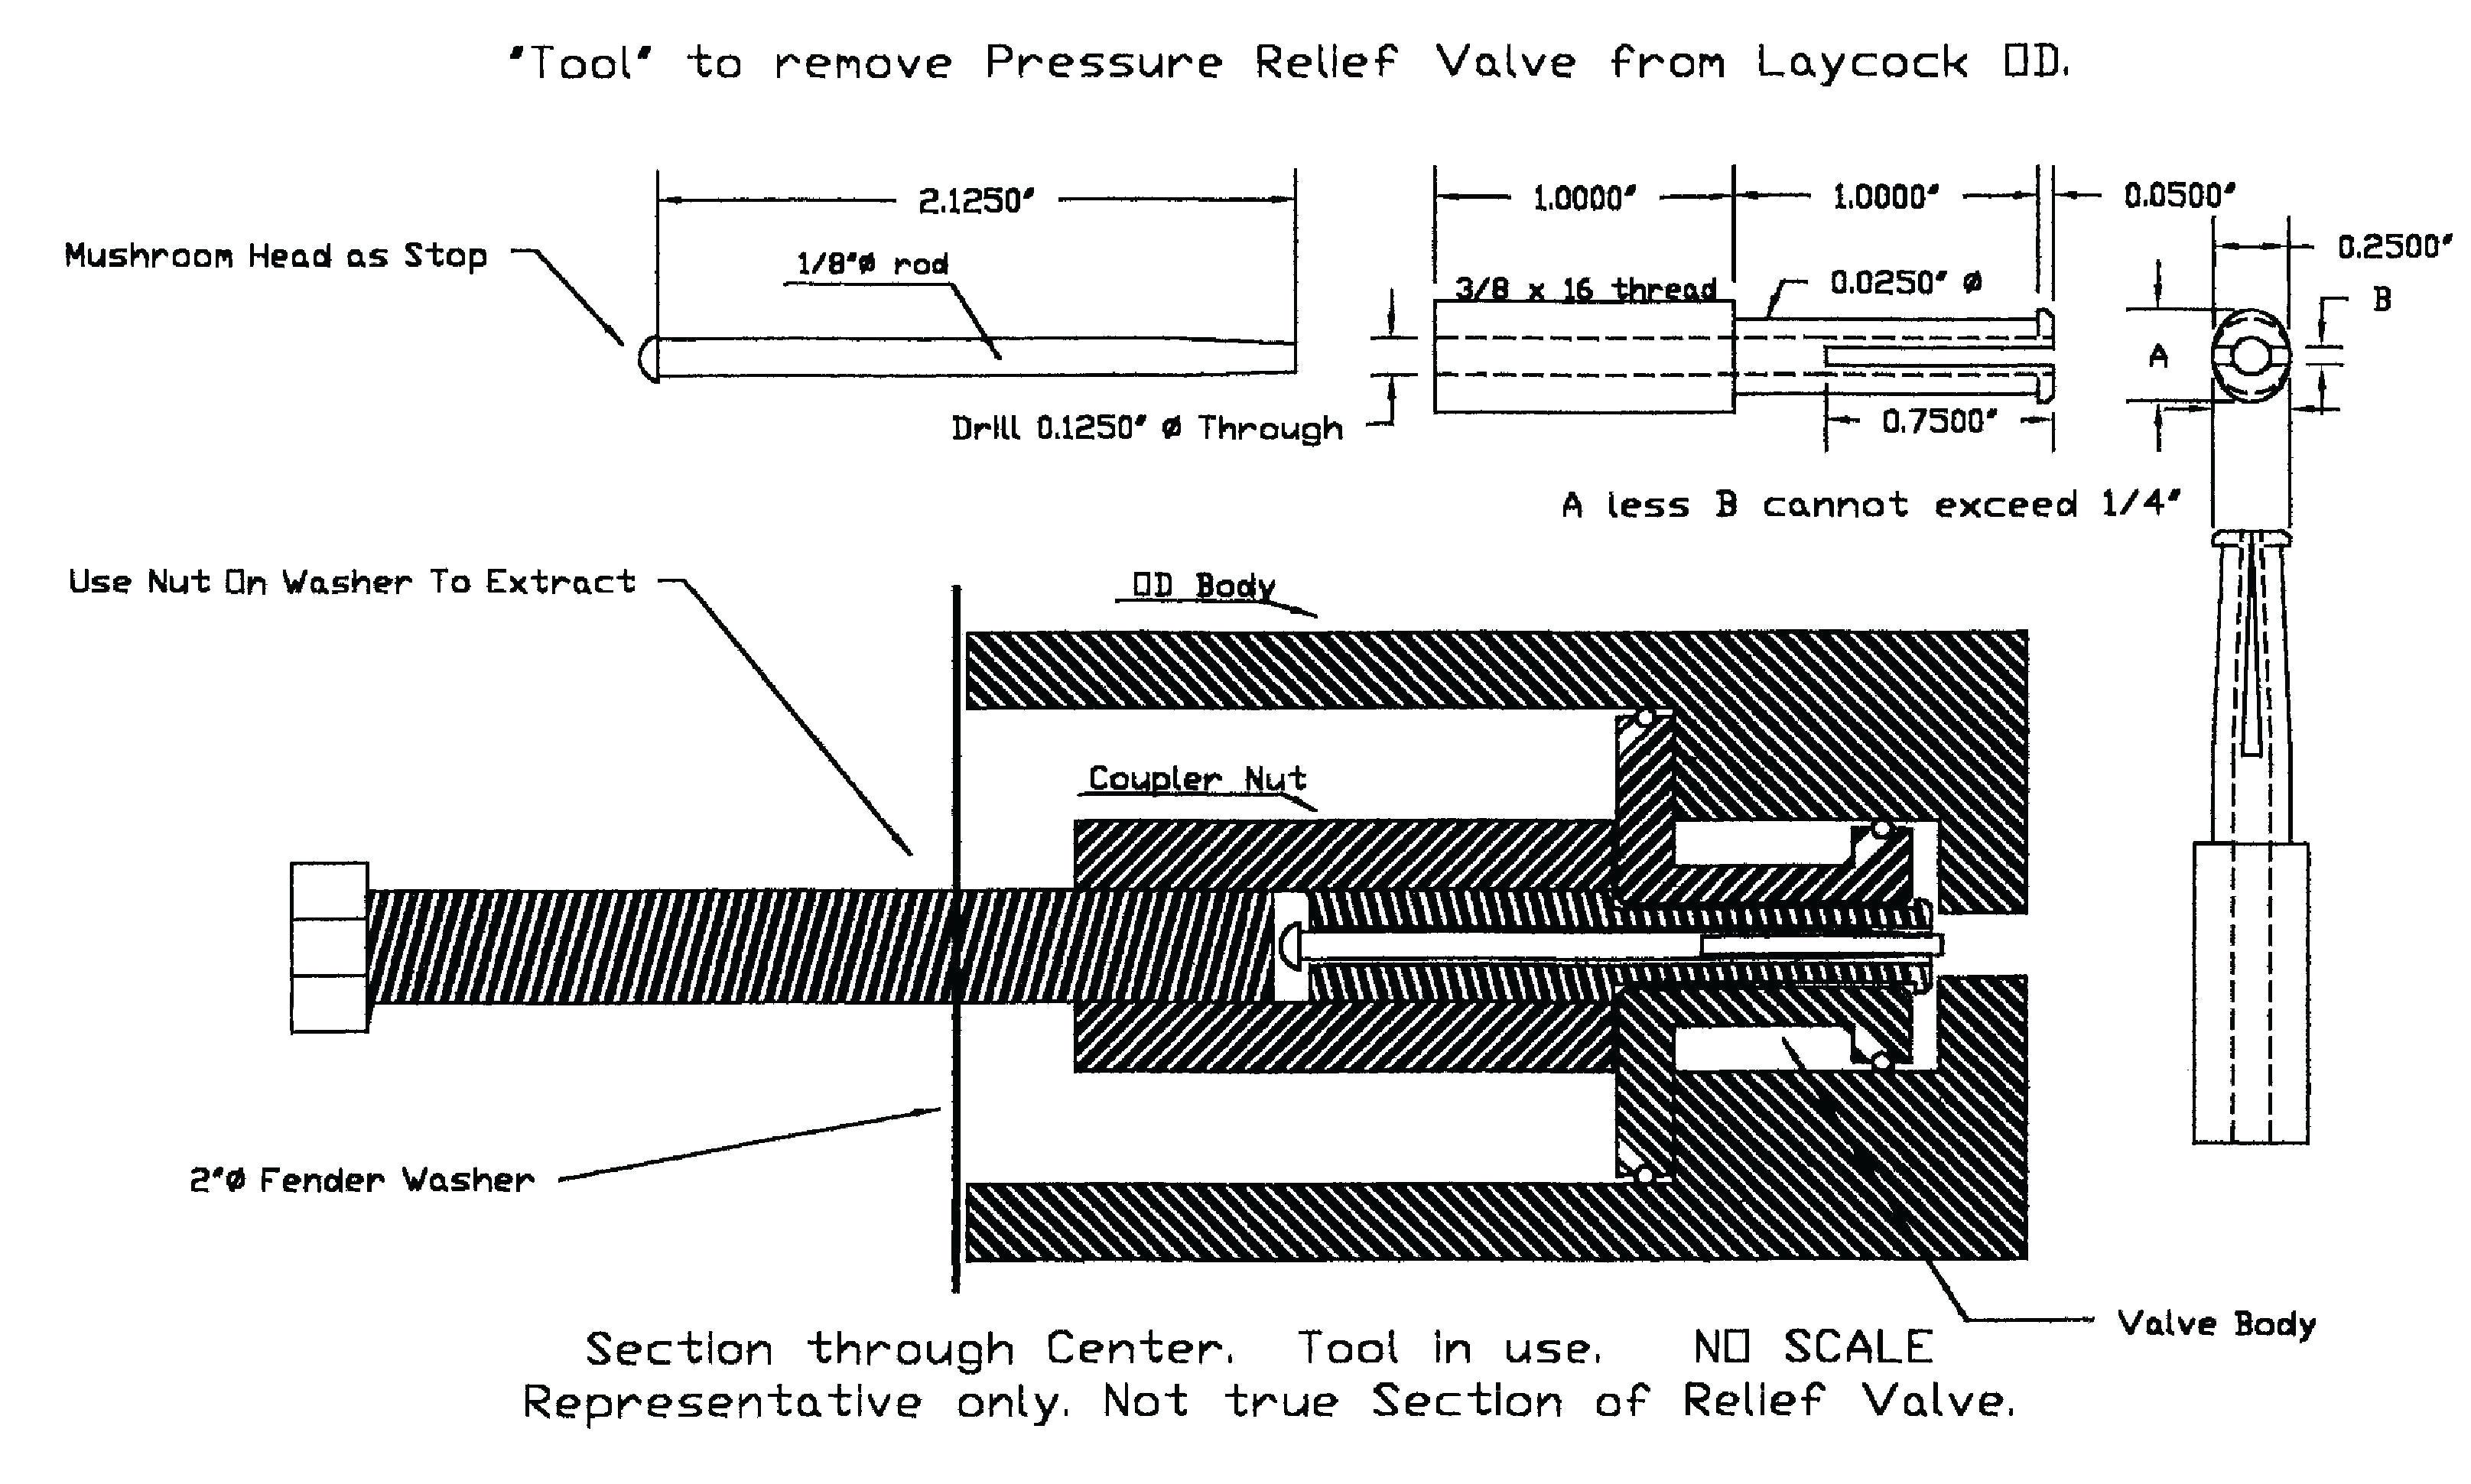 electric guitar wiring diagrams olp 2 pickups 2 wires 1 volume